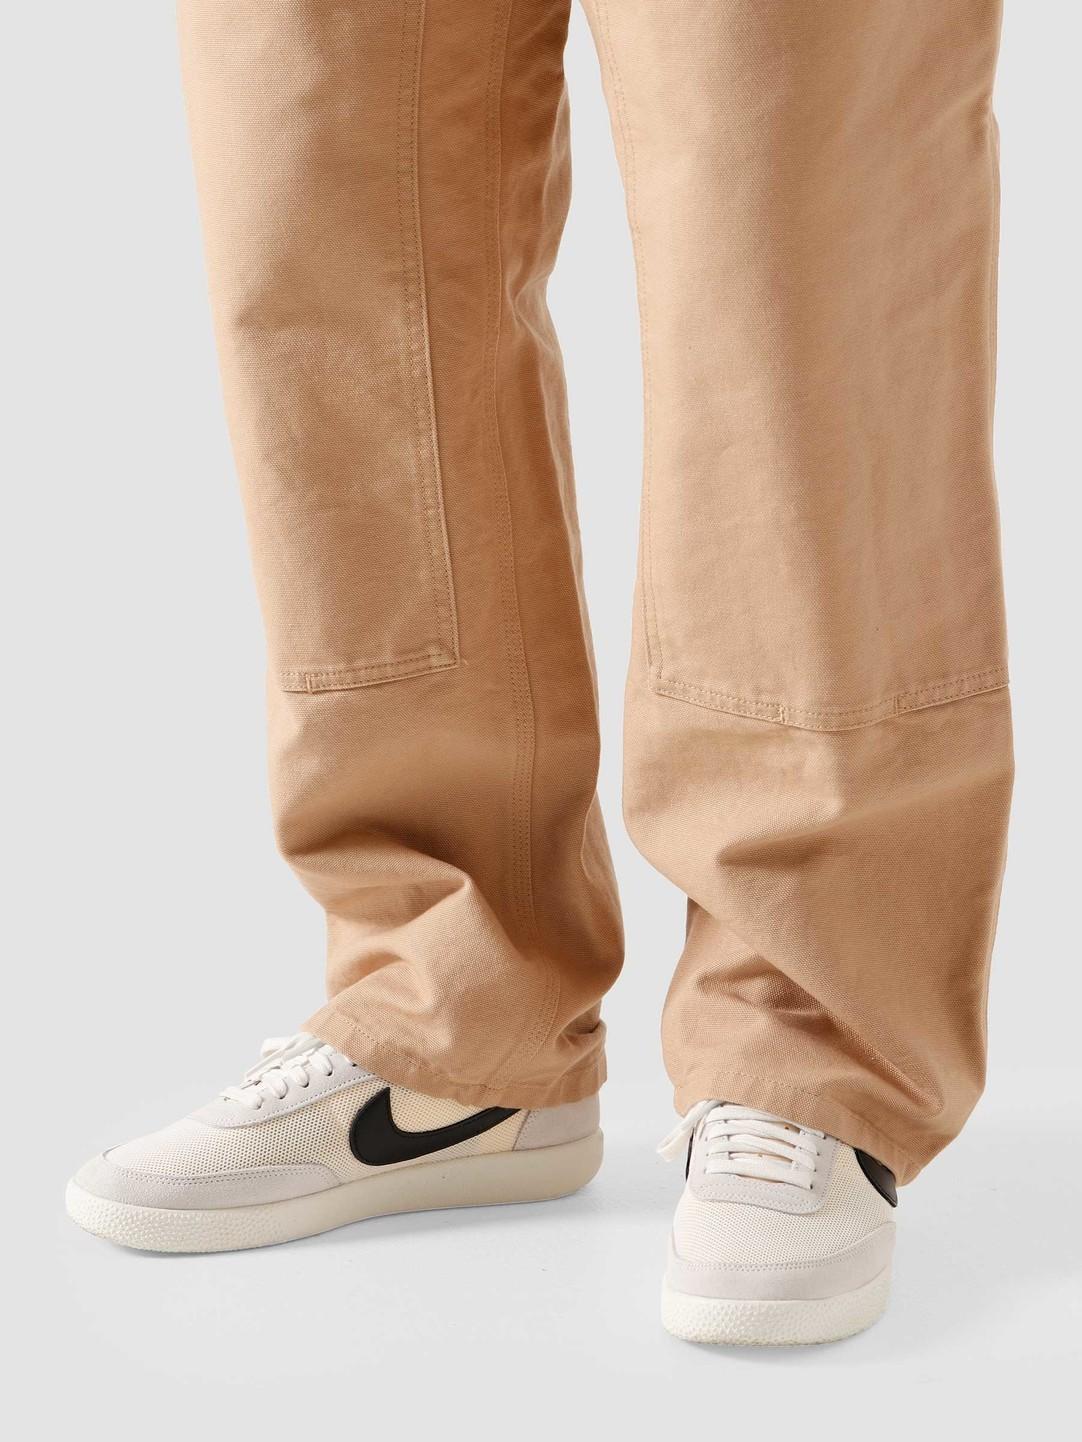 Carhartt WIP Carhartt WIP Double Knee Pant Dusty H Brown I029196-700